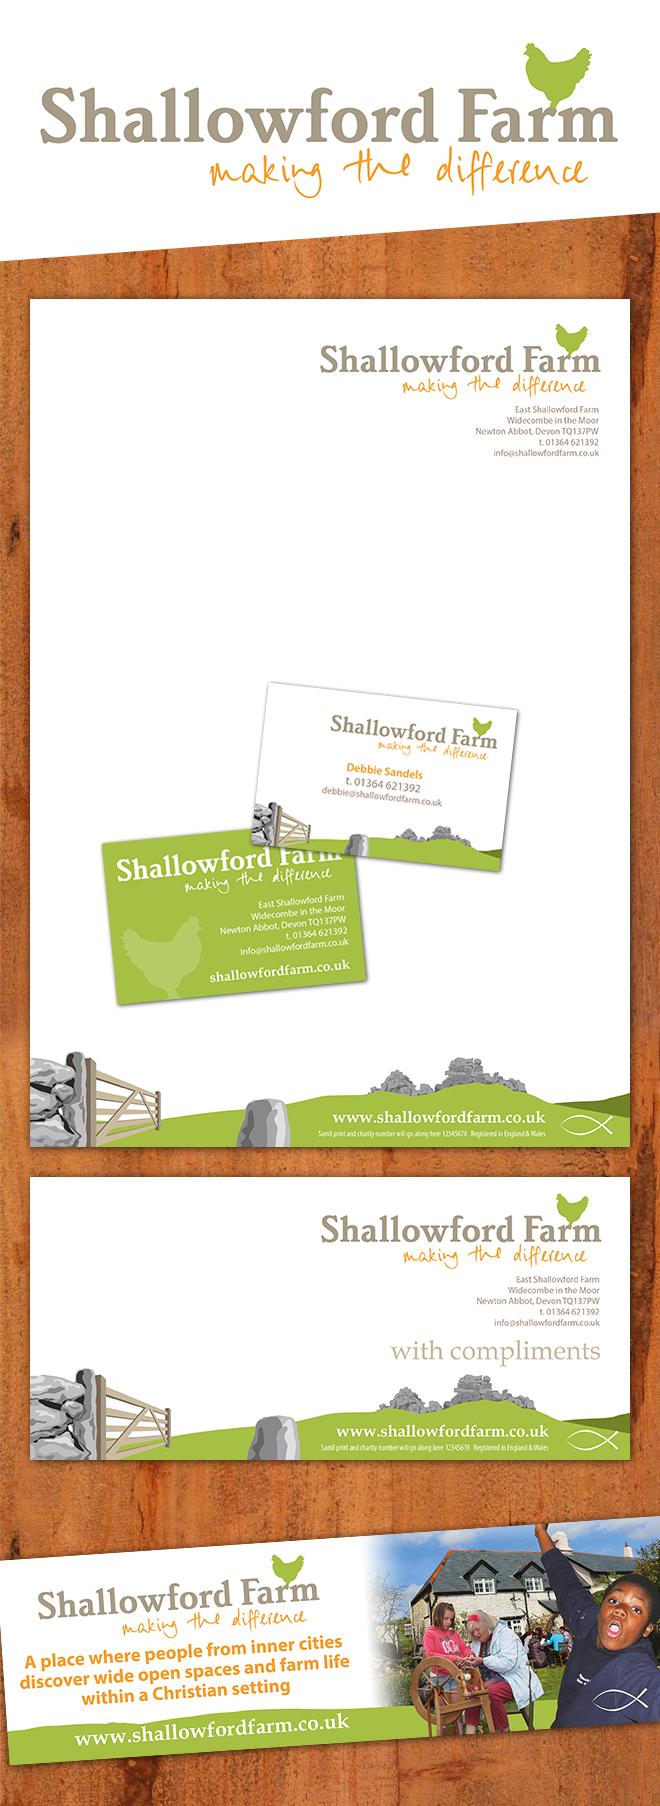 Shallowford Farm Branding Design